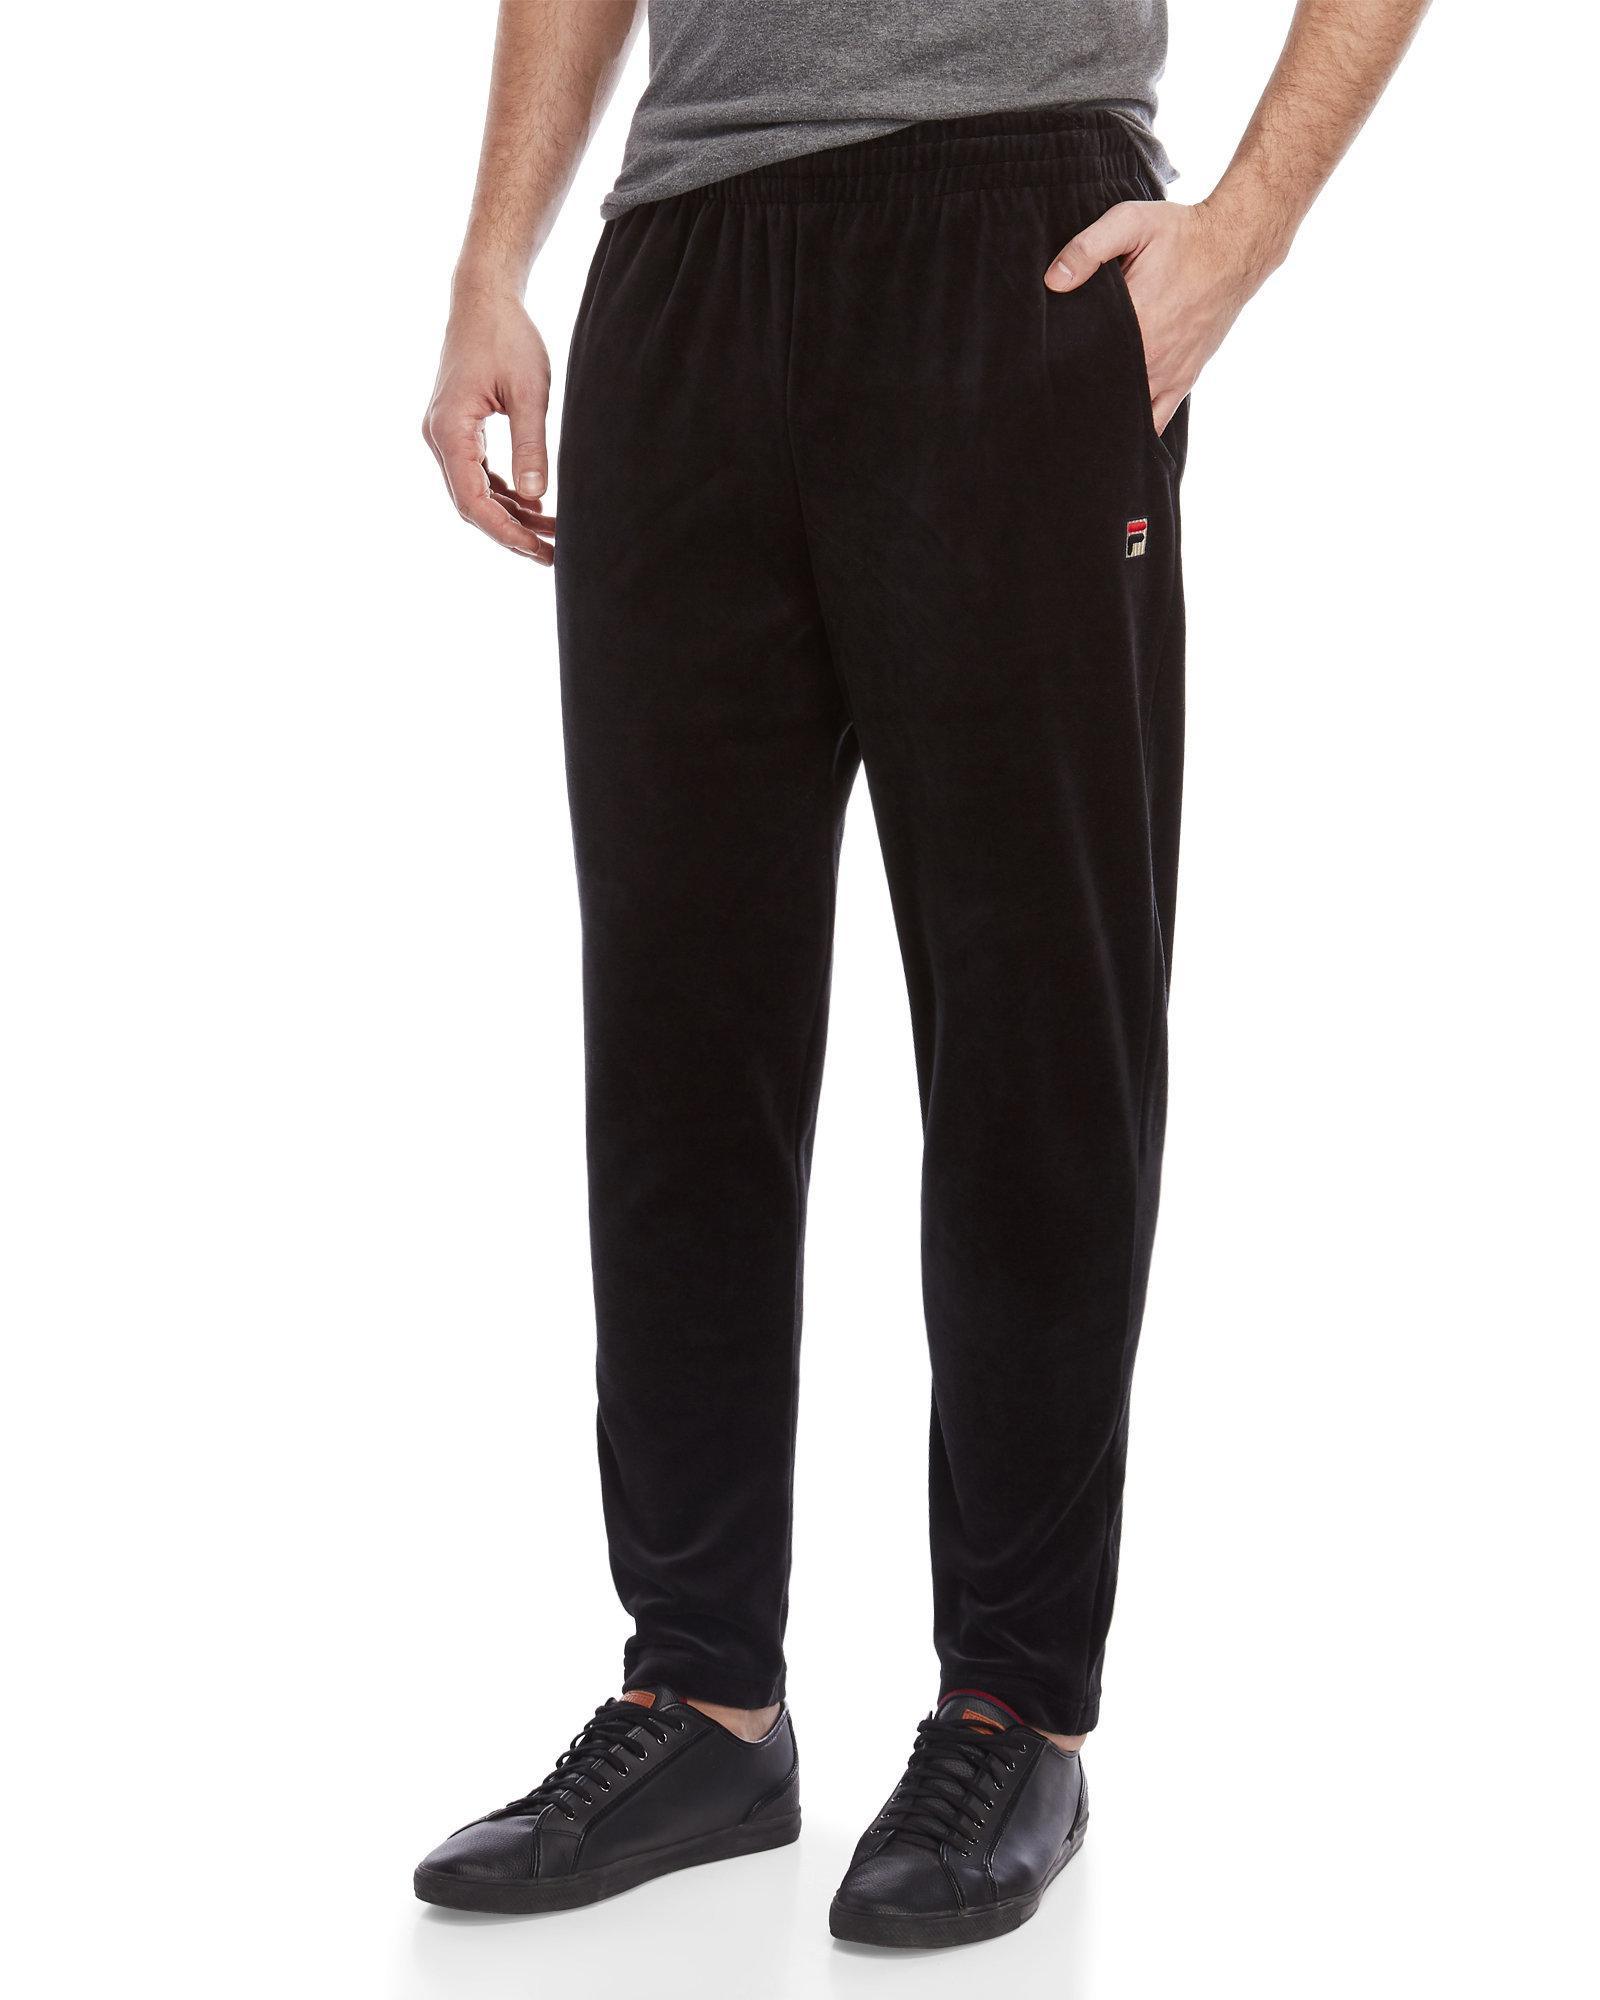 c8d4d30c34b Fila Slim Fit Velour Pants in Black for Men - Lyst